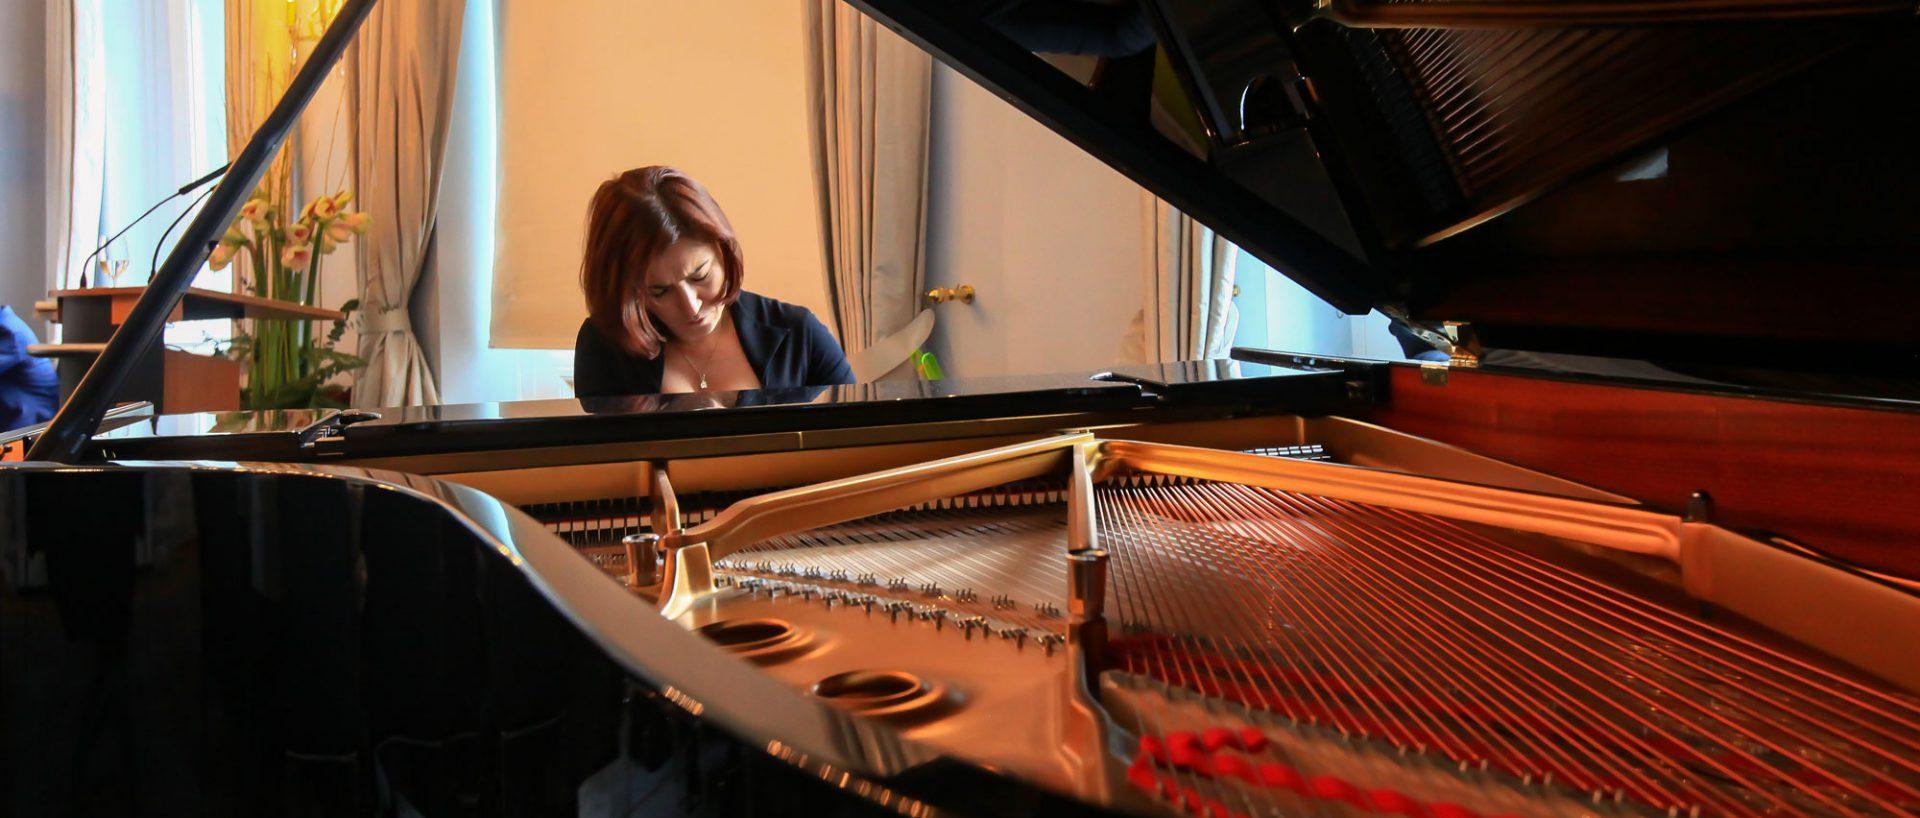 Die ukrainische Pianistin Marija Kim